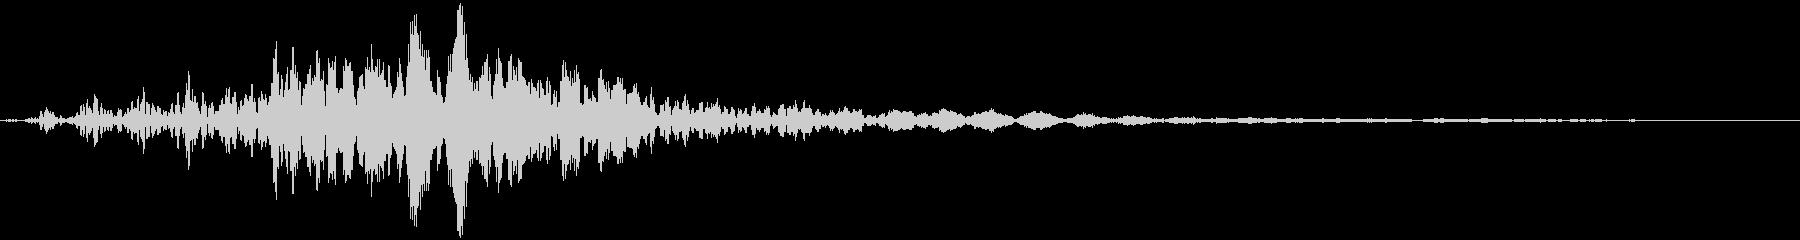 CINEMATIC SFX(SF・未来)の未再生の波形